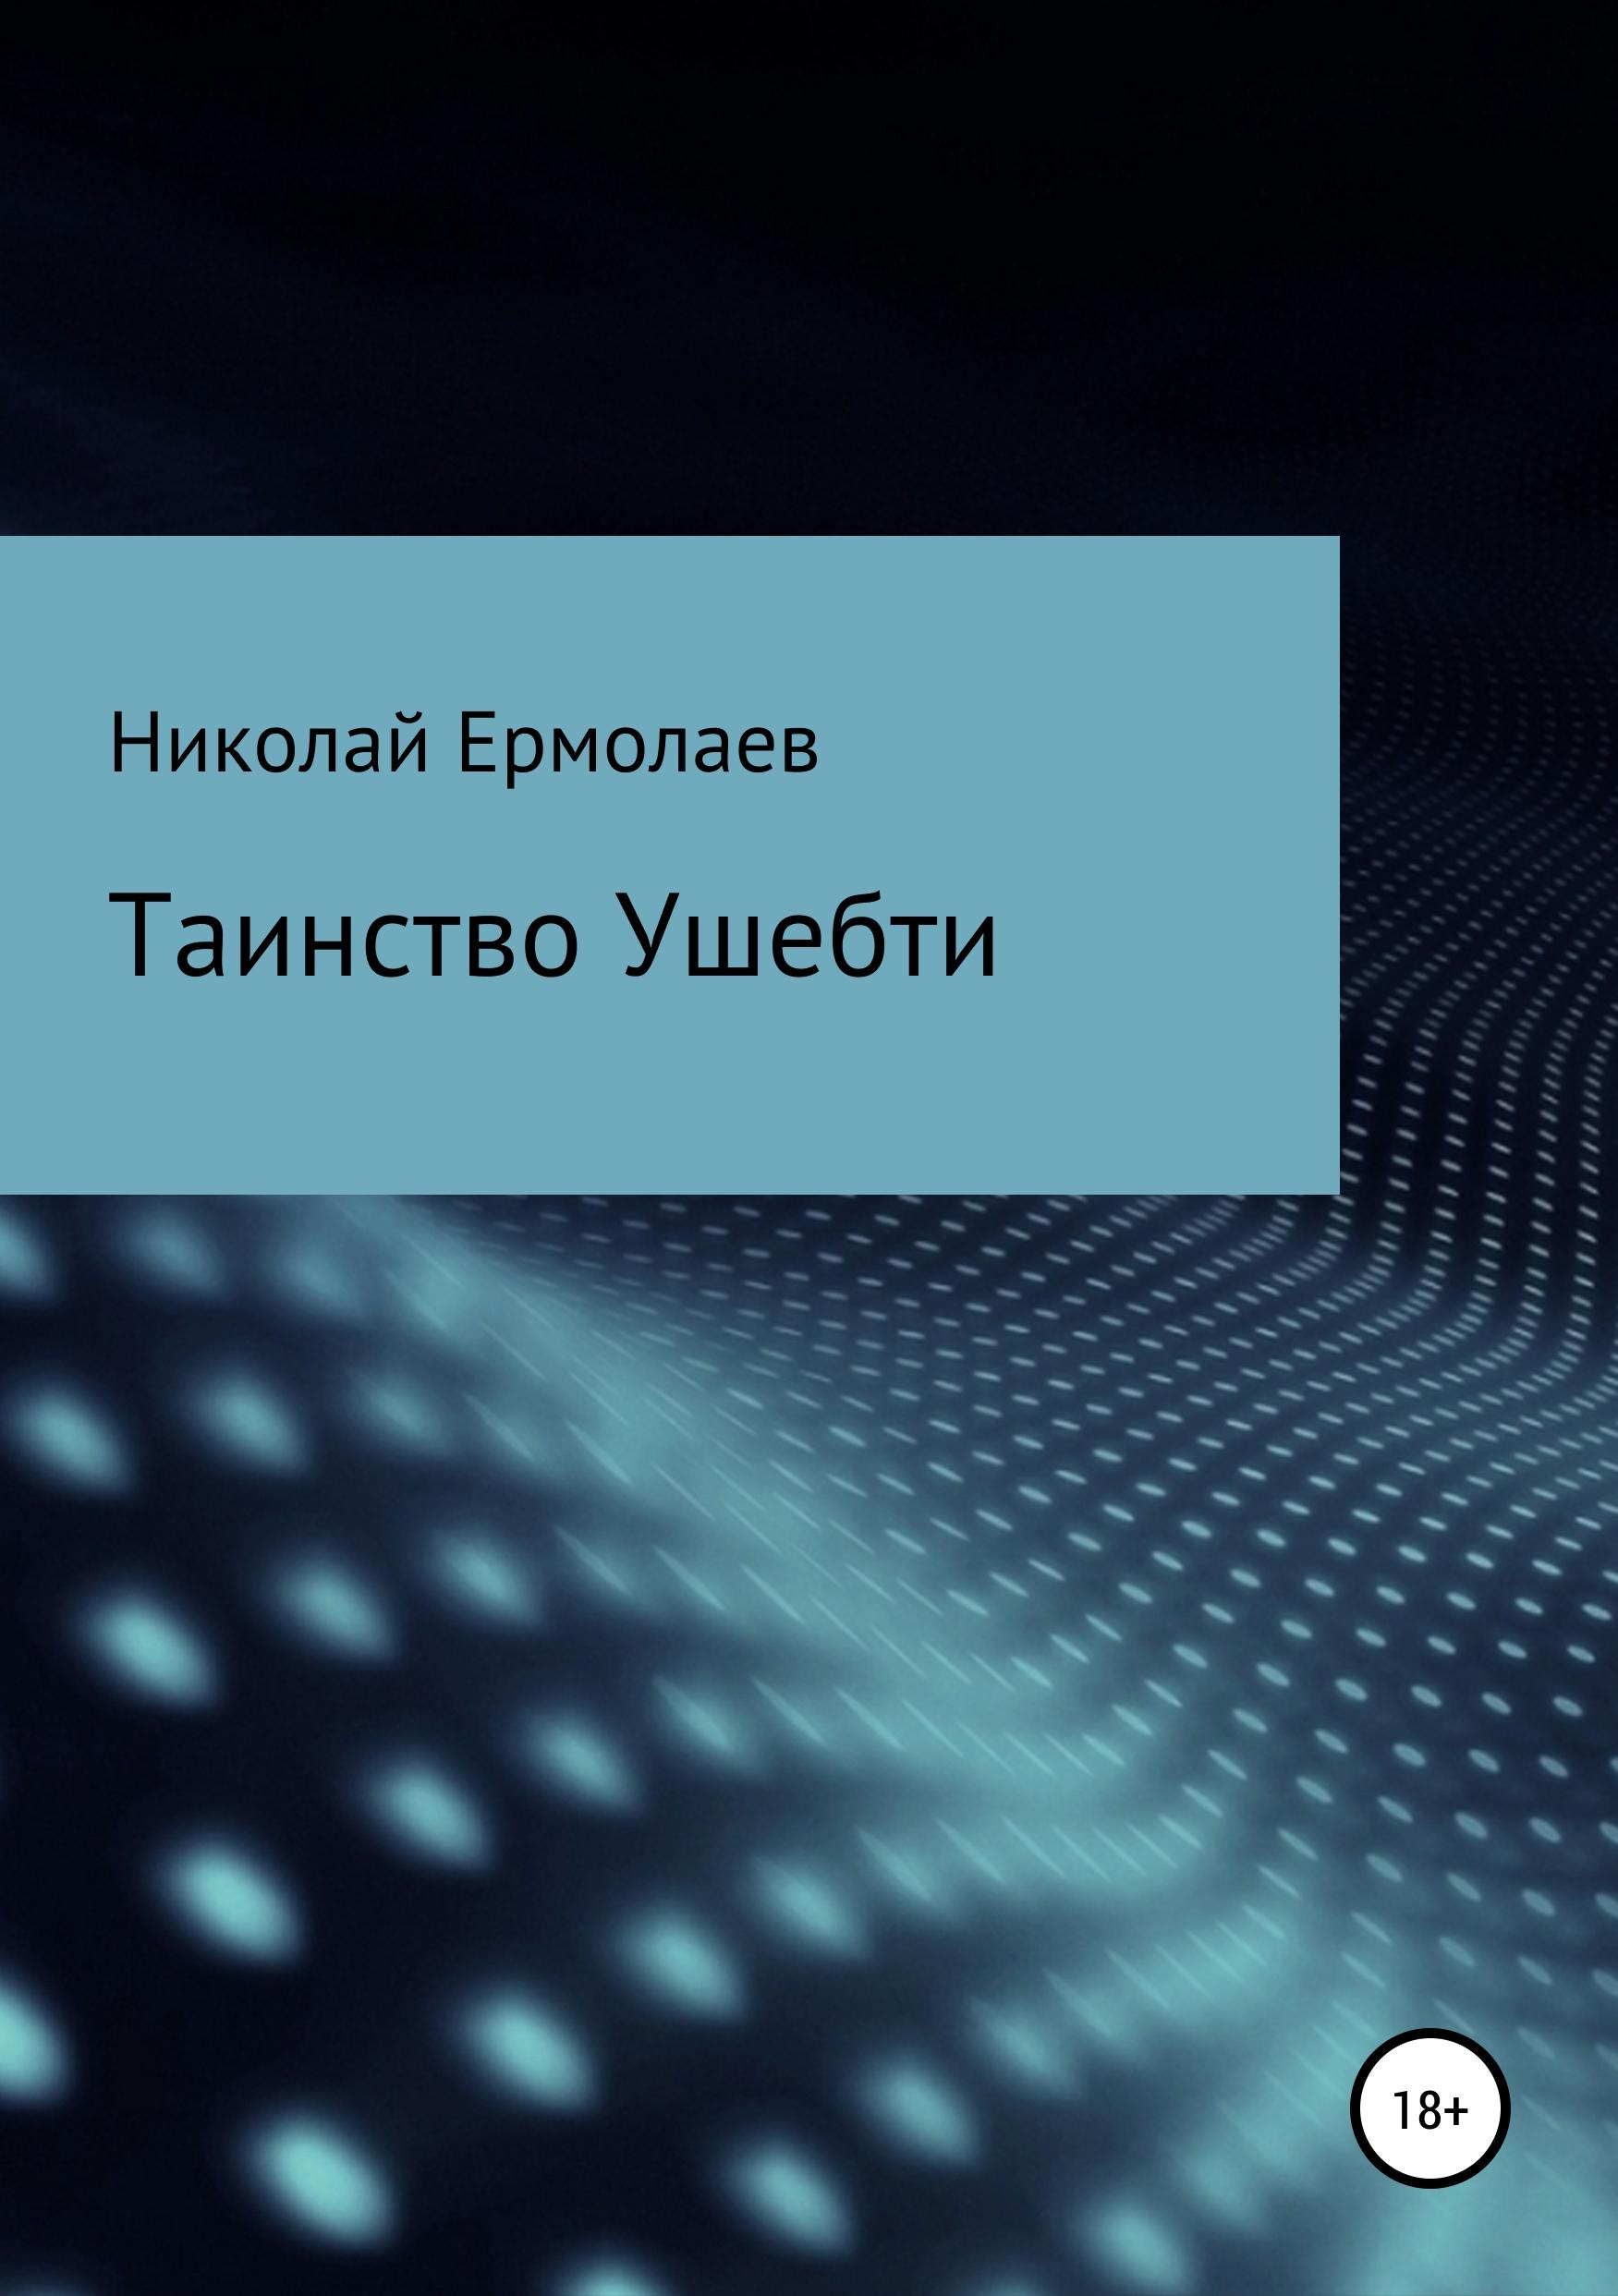 Николай Анатольевич Ермолаев Таинство Ушебти